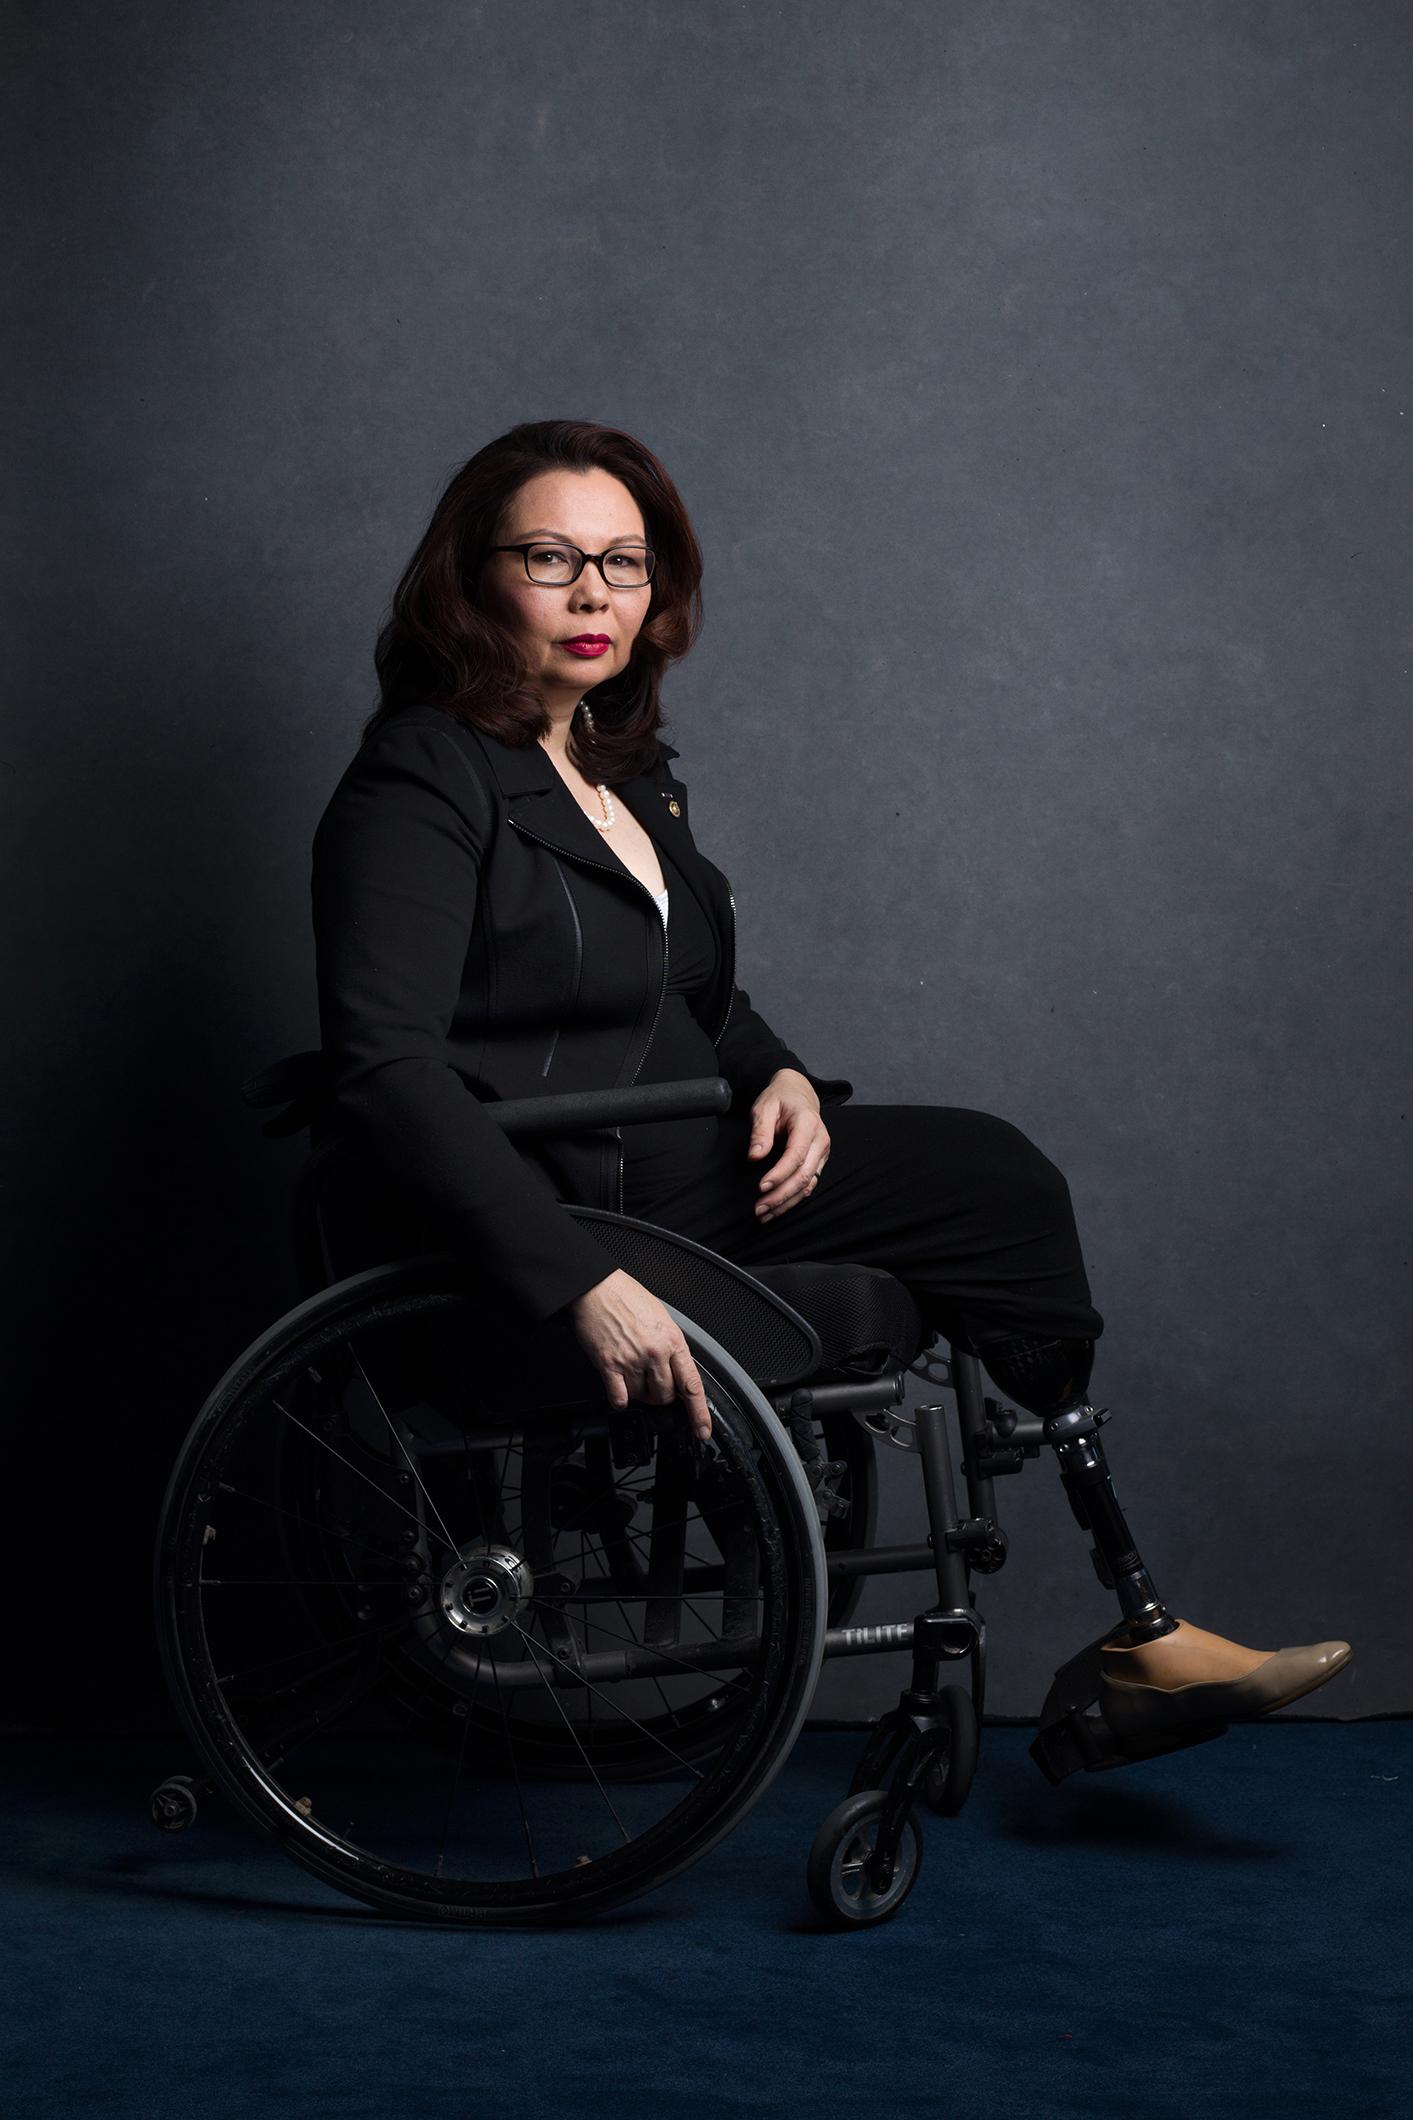 ***HOLD FOR WOMEN IN CONGRESS PROJECT, CONTACT MARISA SCHWARTZ TAYLOR*** Senator Tammy Duckworth, Democrat of IllinoisCredit: Celeste Sloman for The New York Times                              NYTCREDIT: Celeste Sloman for The New York Times